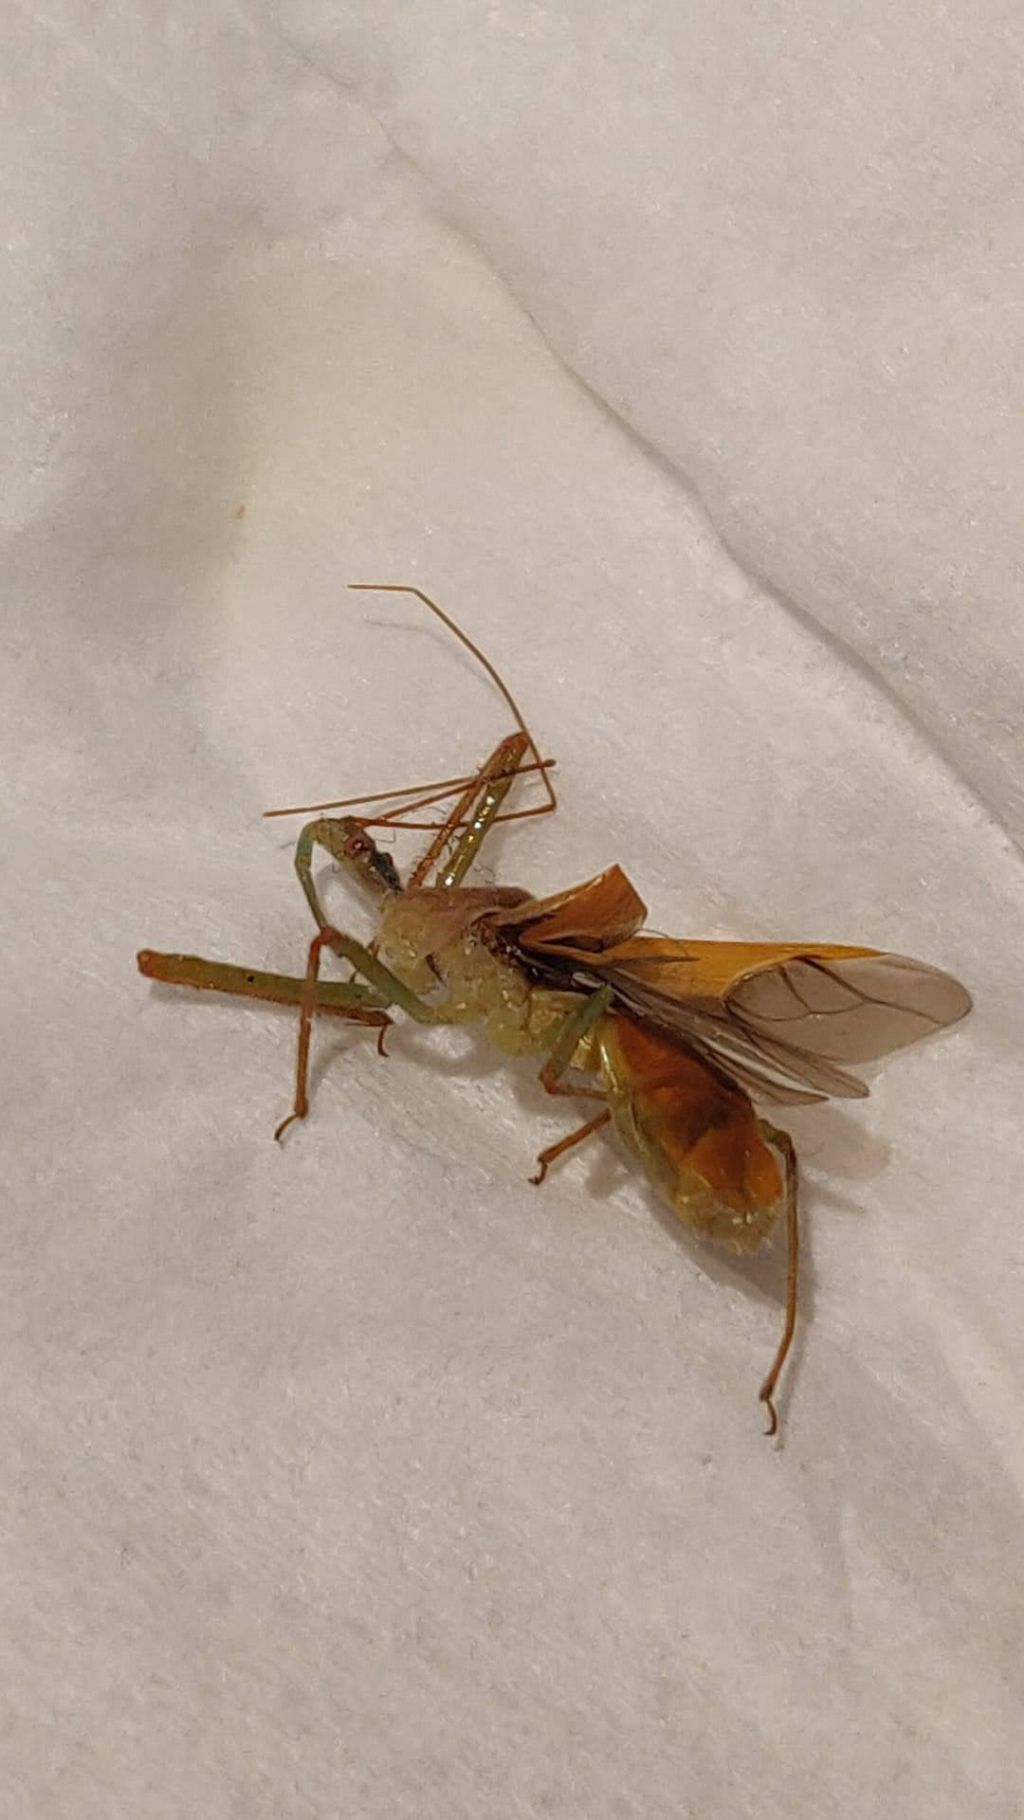 Reduviidae: Zelus renardii